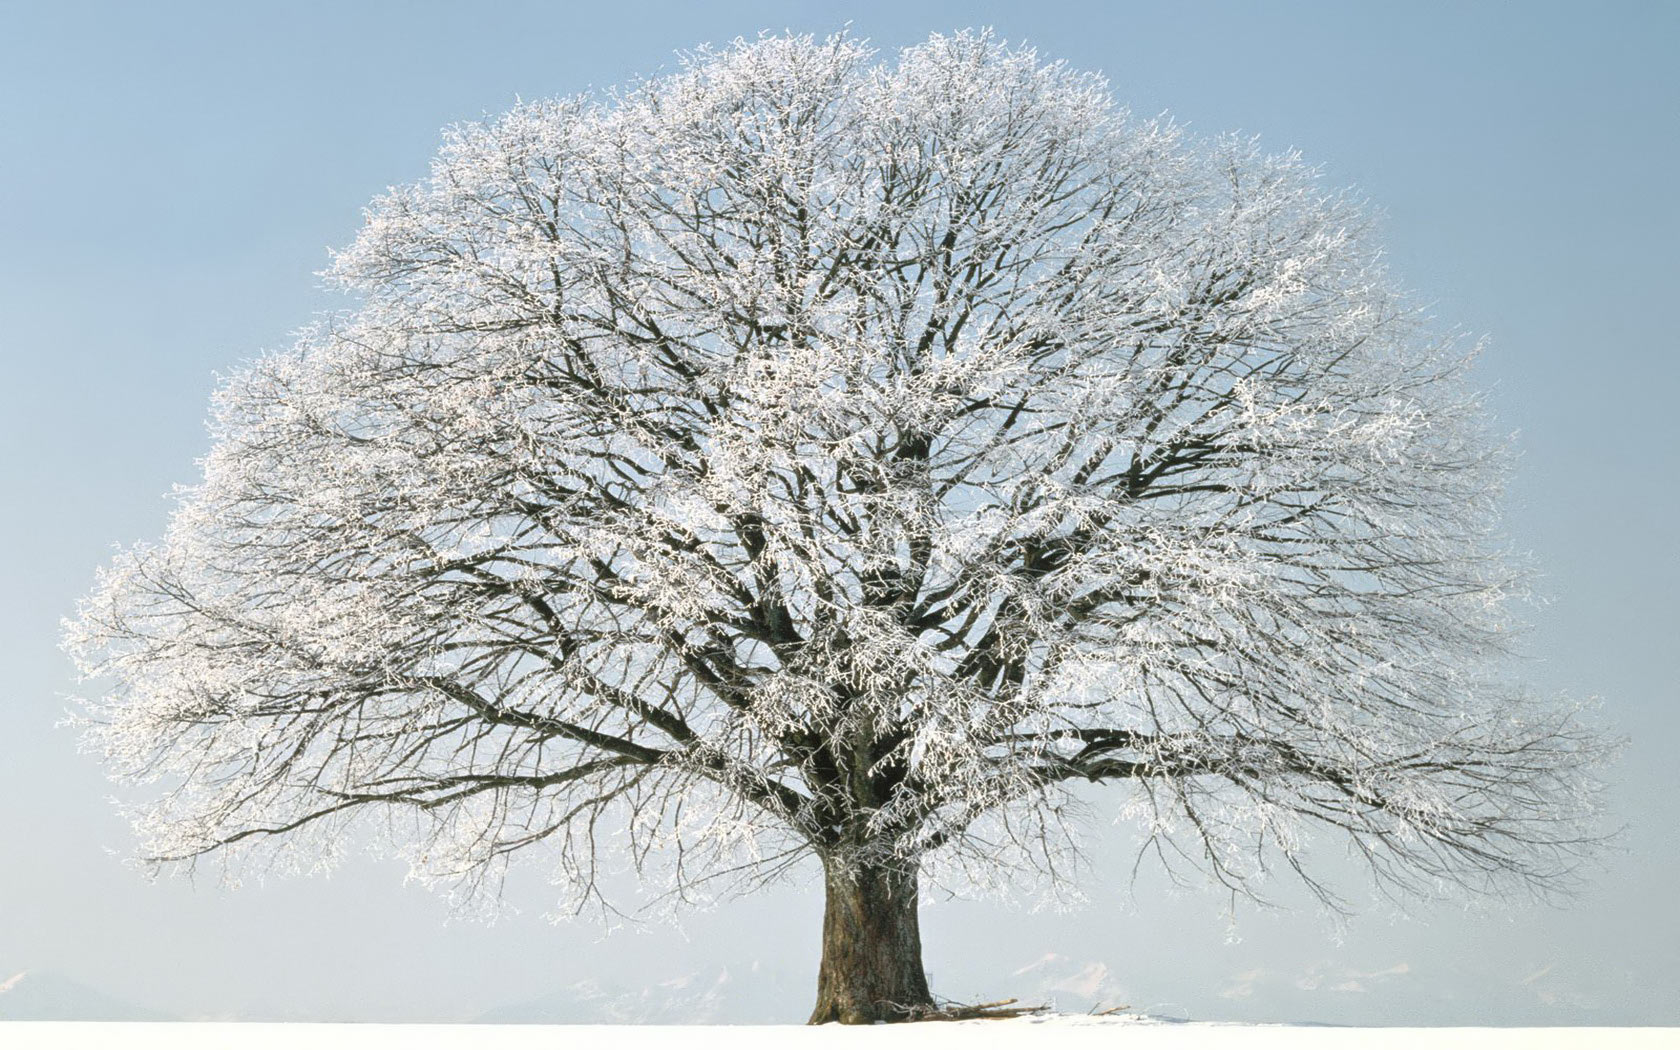 Winter Snow Wallpaper 1680x1050 Winter Snow 1680x1050